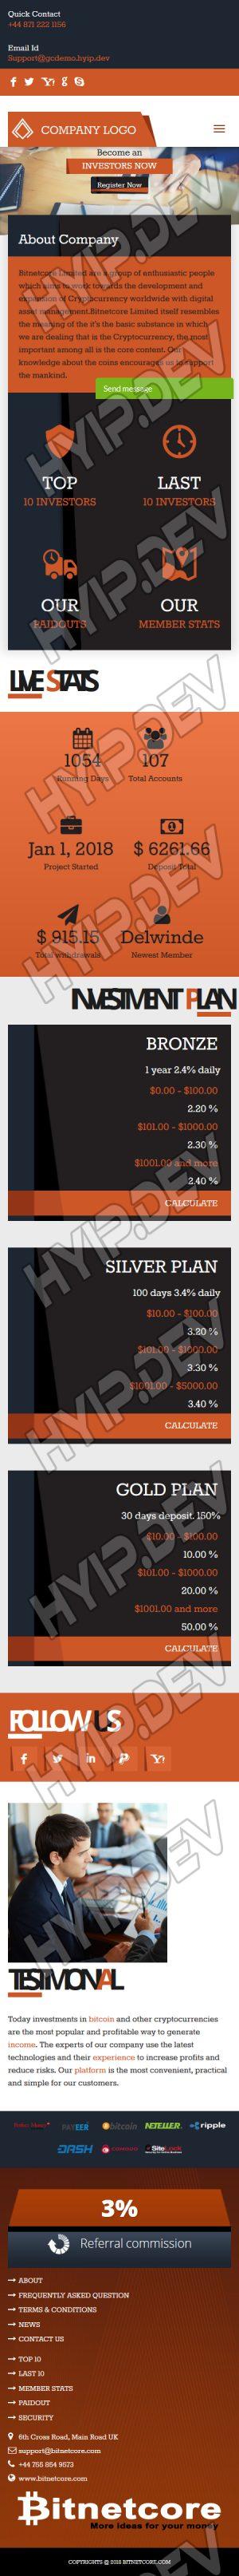 goldcoders hyip template no. 076, responsive page screenshot